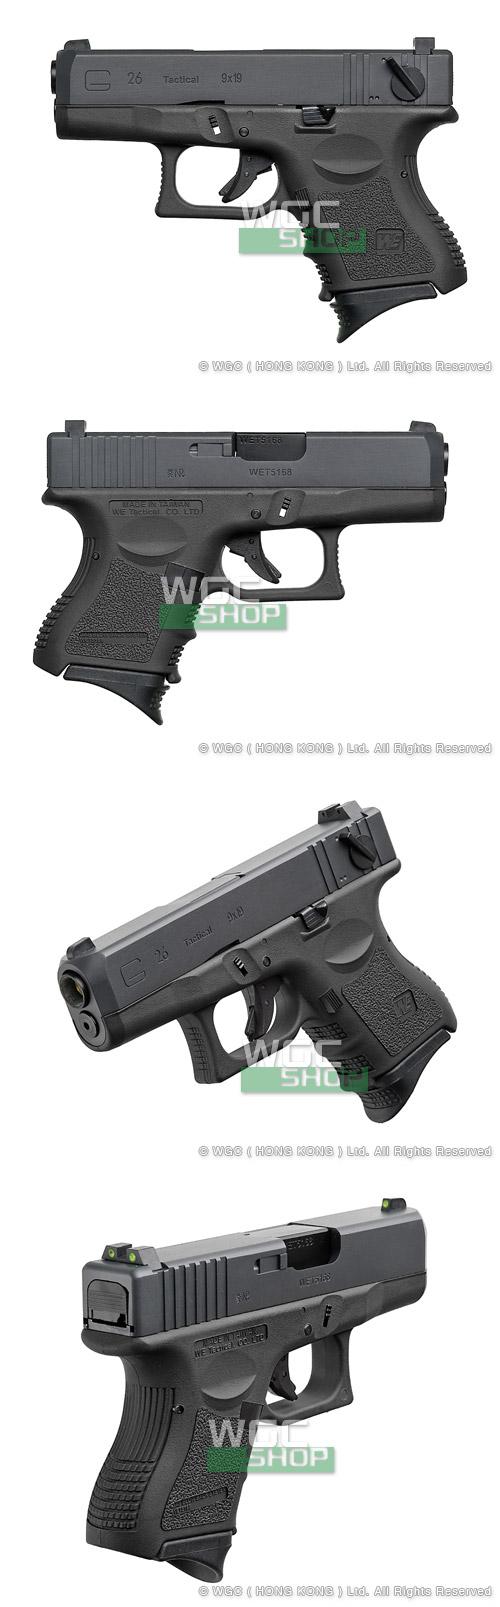 WE Glock 26C2